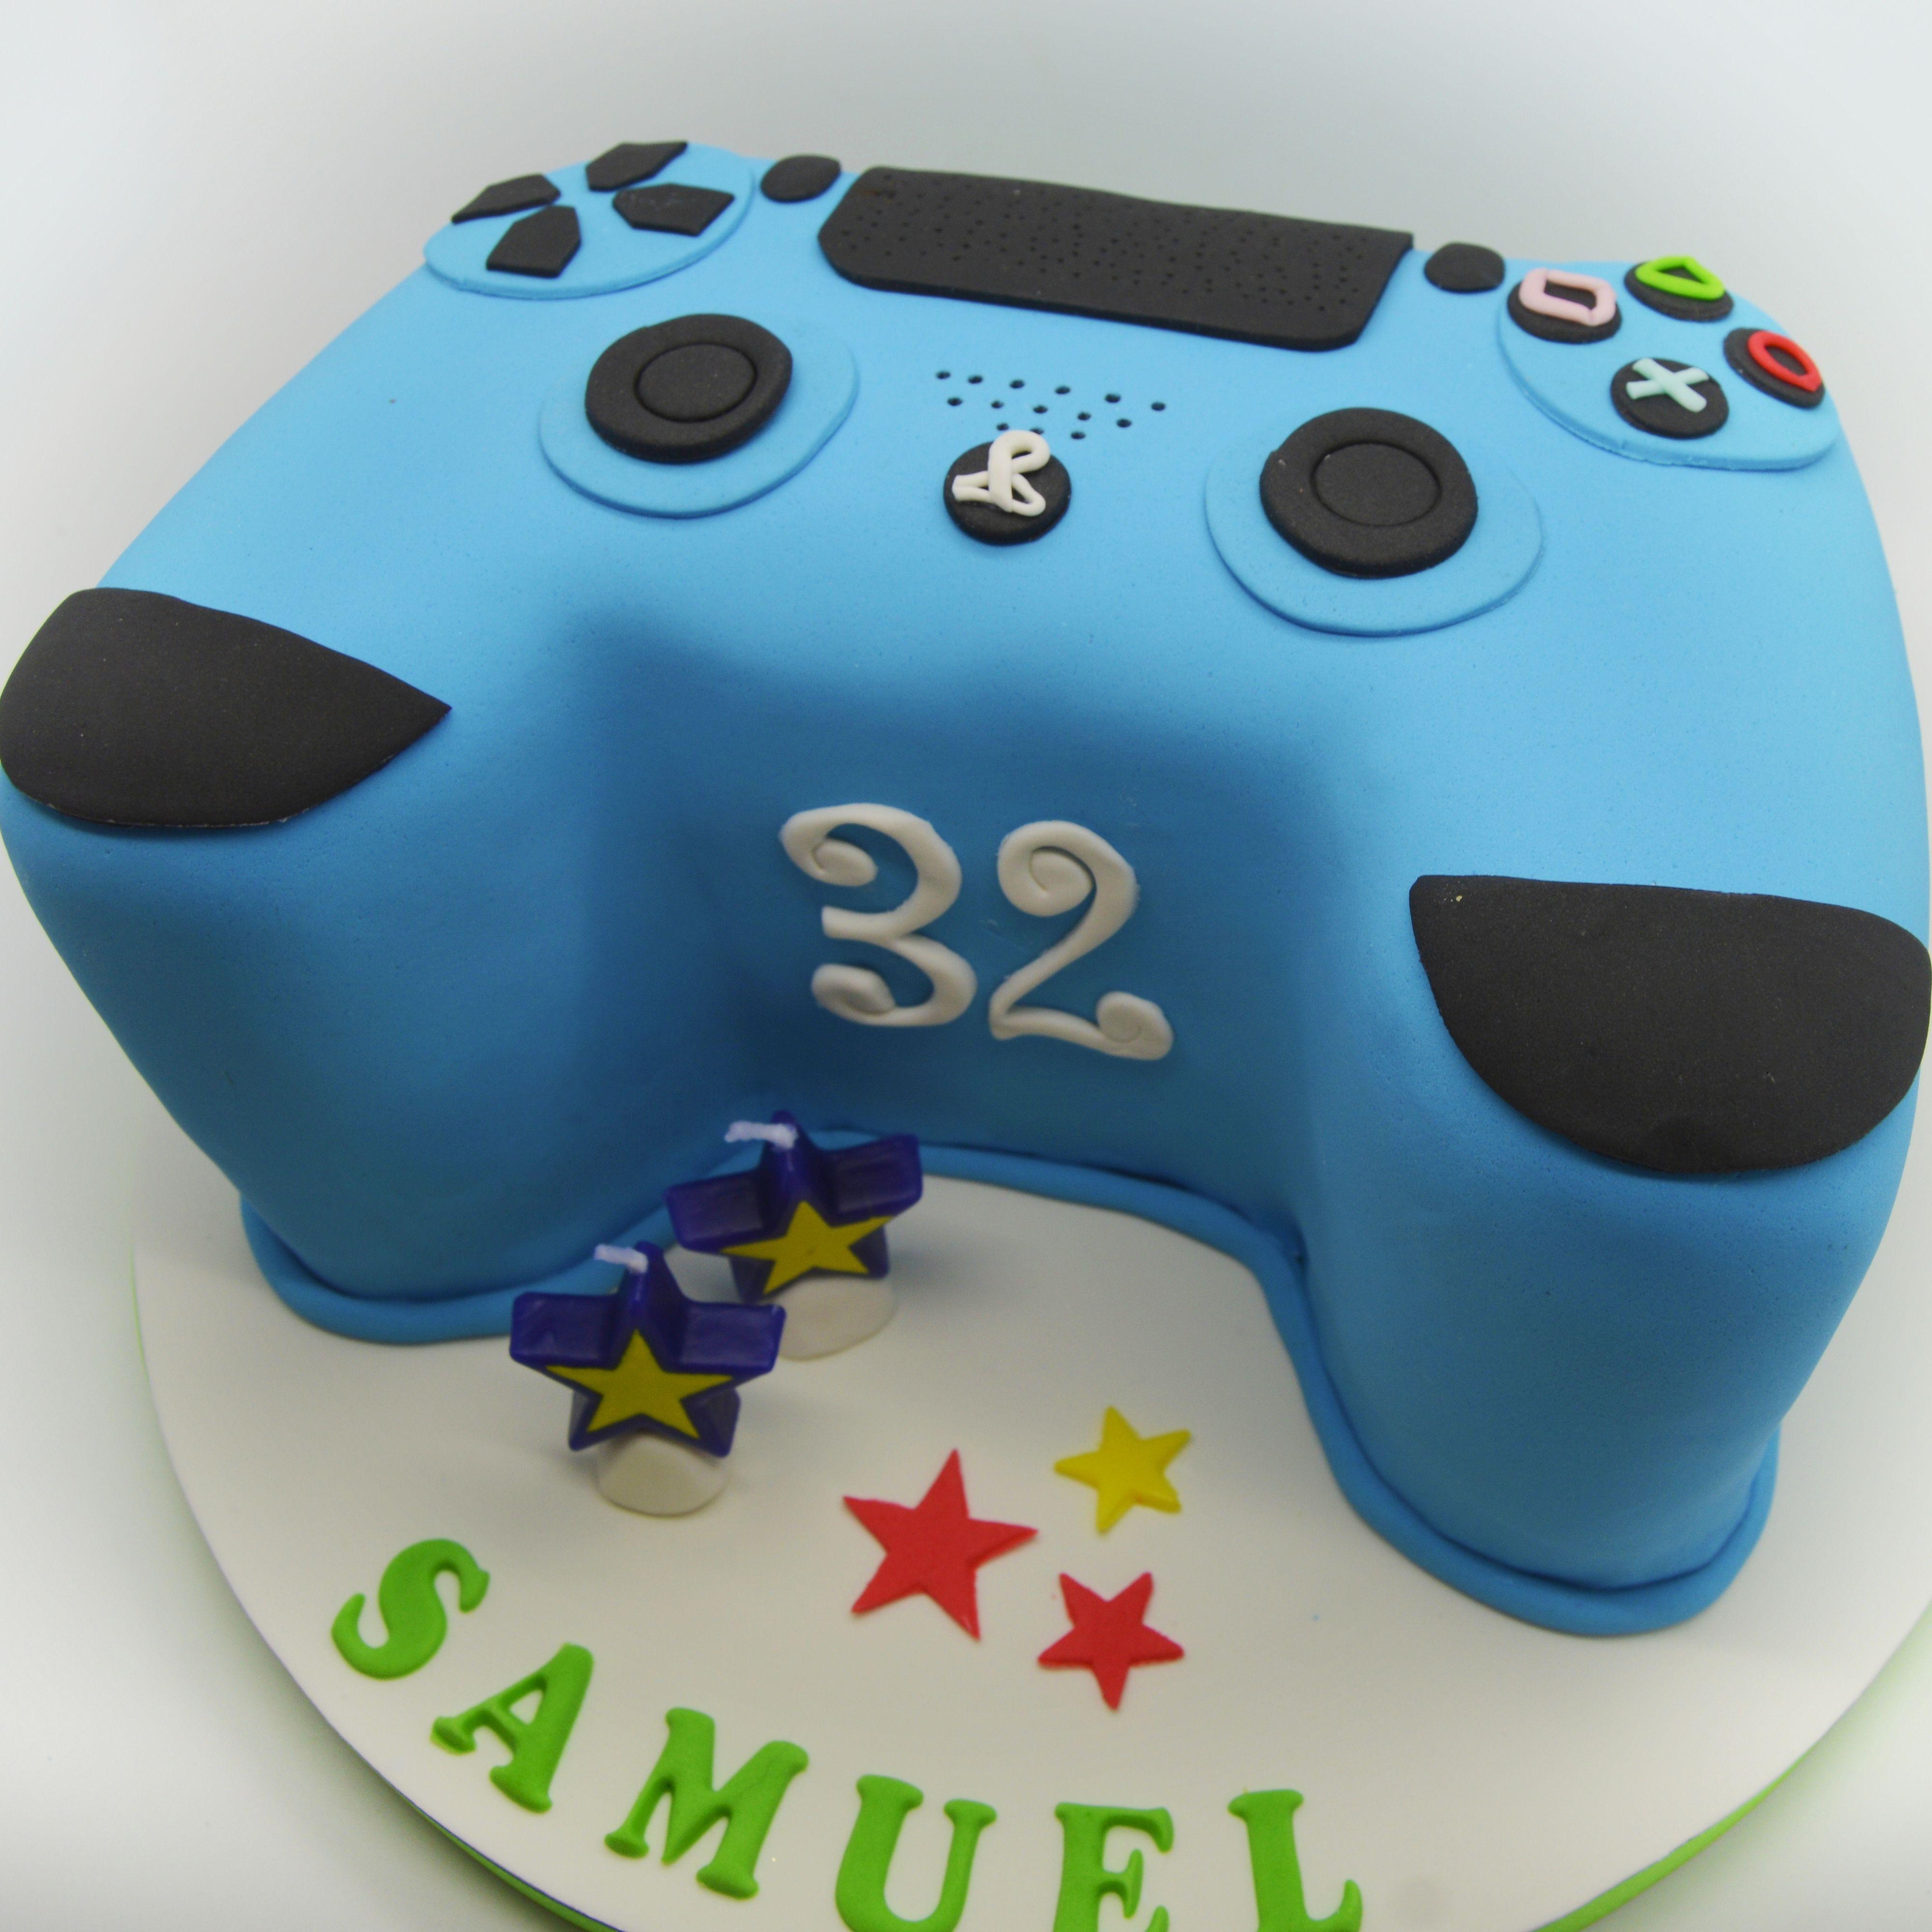 PS4 Remote Control Cake Birthdaycake Sugarpaste Cakedesign